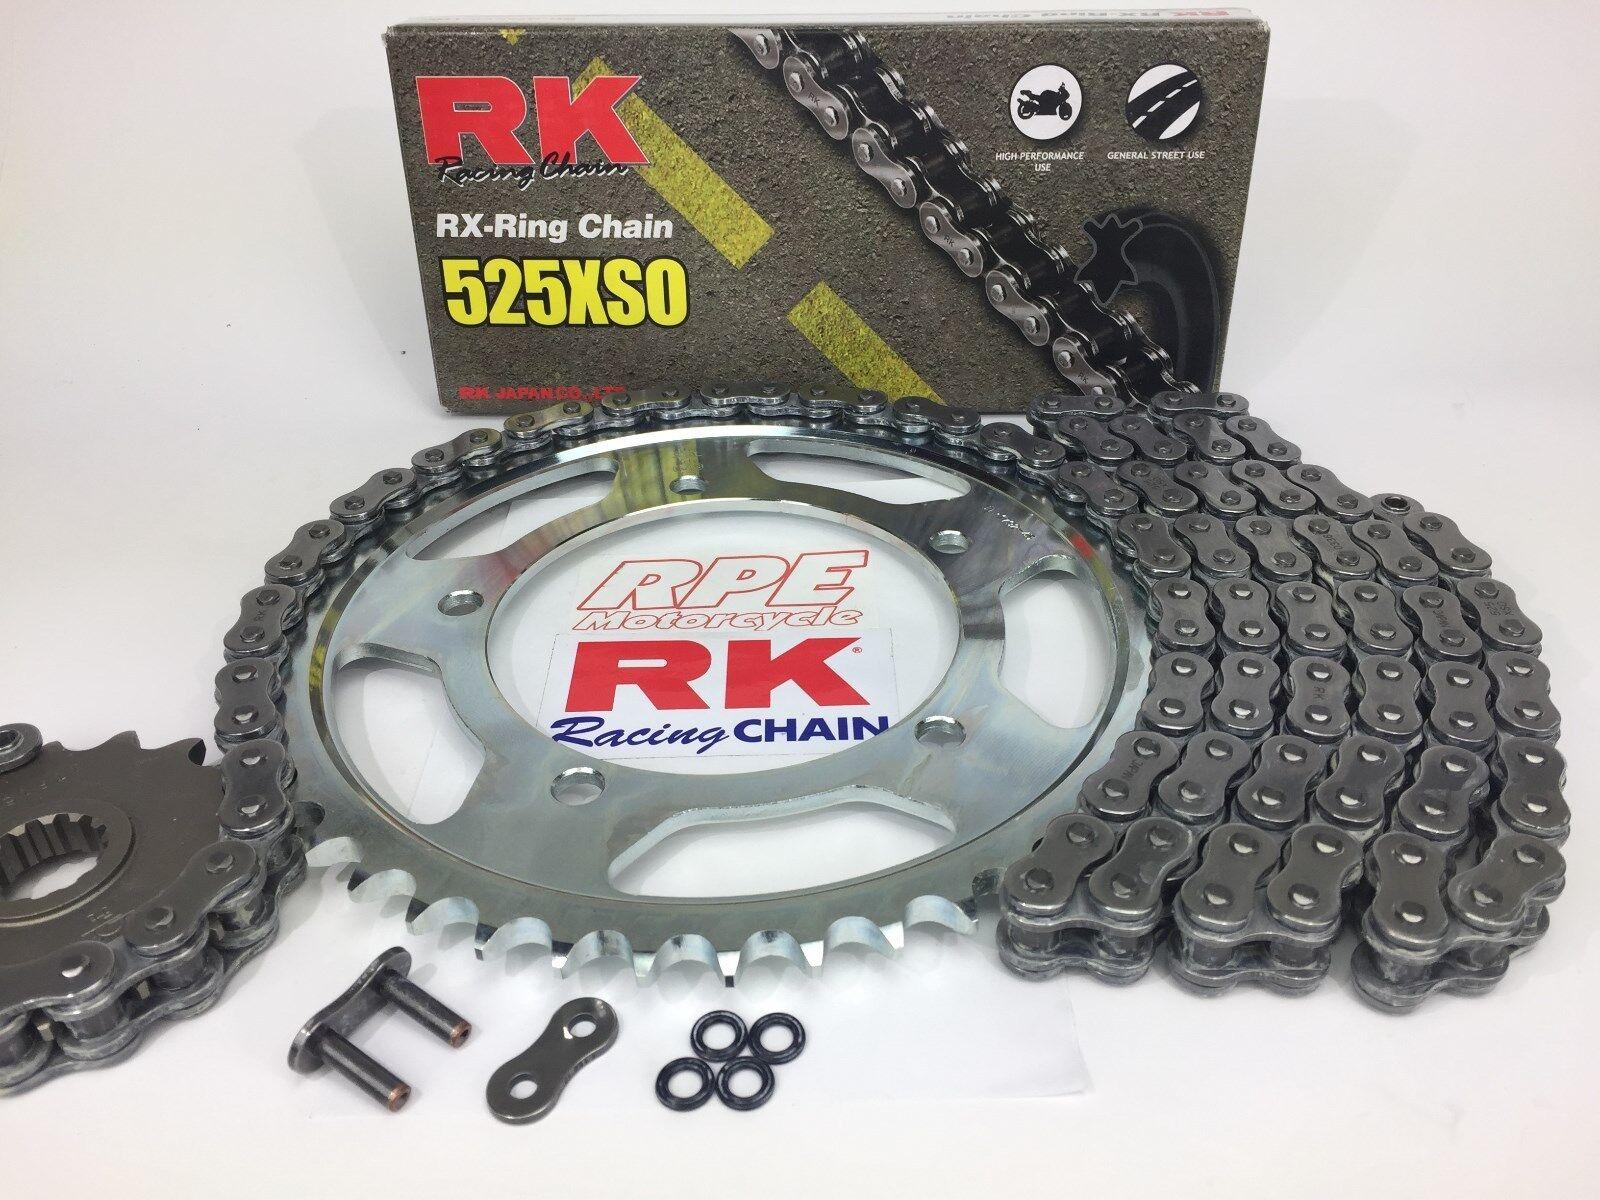 Honda CBR600F 2011-2013 Renthal /& DID 520 Pitch Race Chain Sprocket Kit